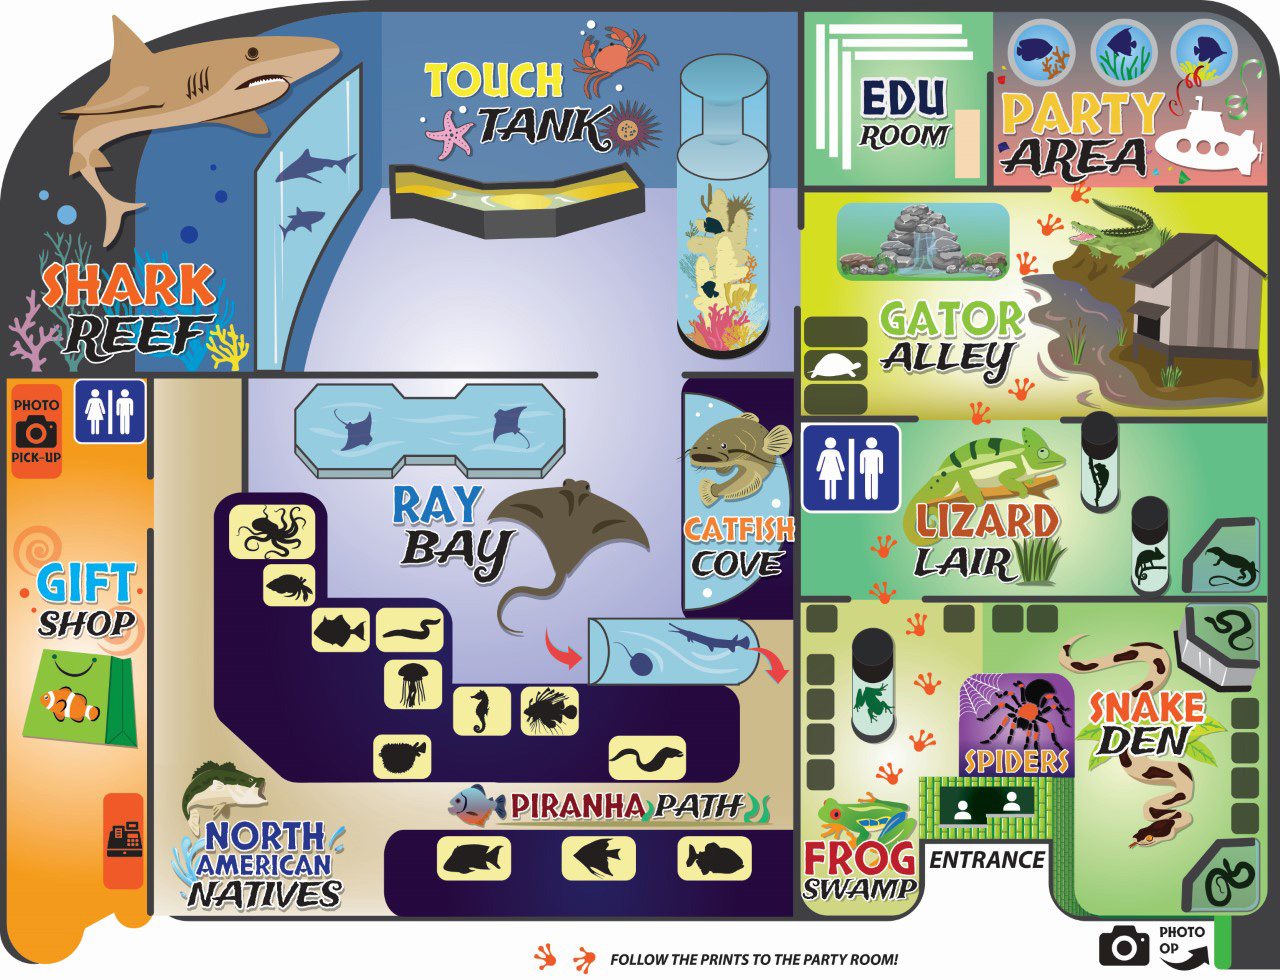 electric city aquarium map scranton pa